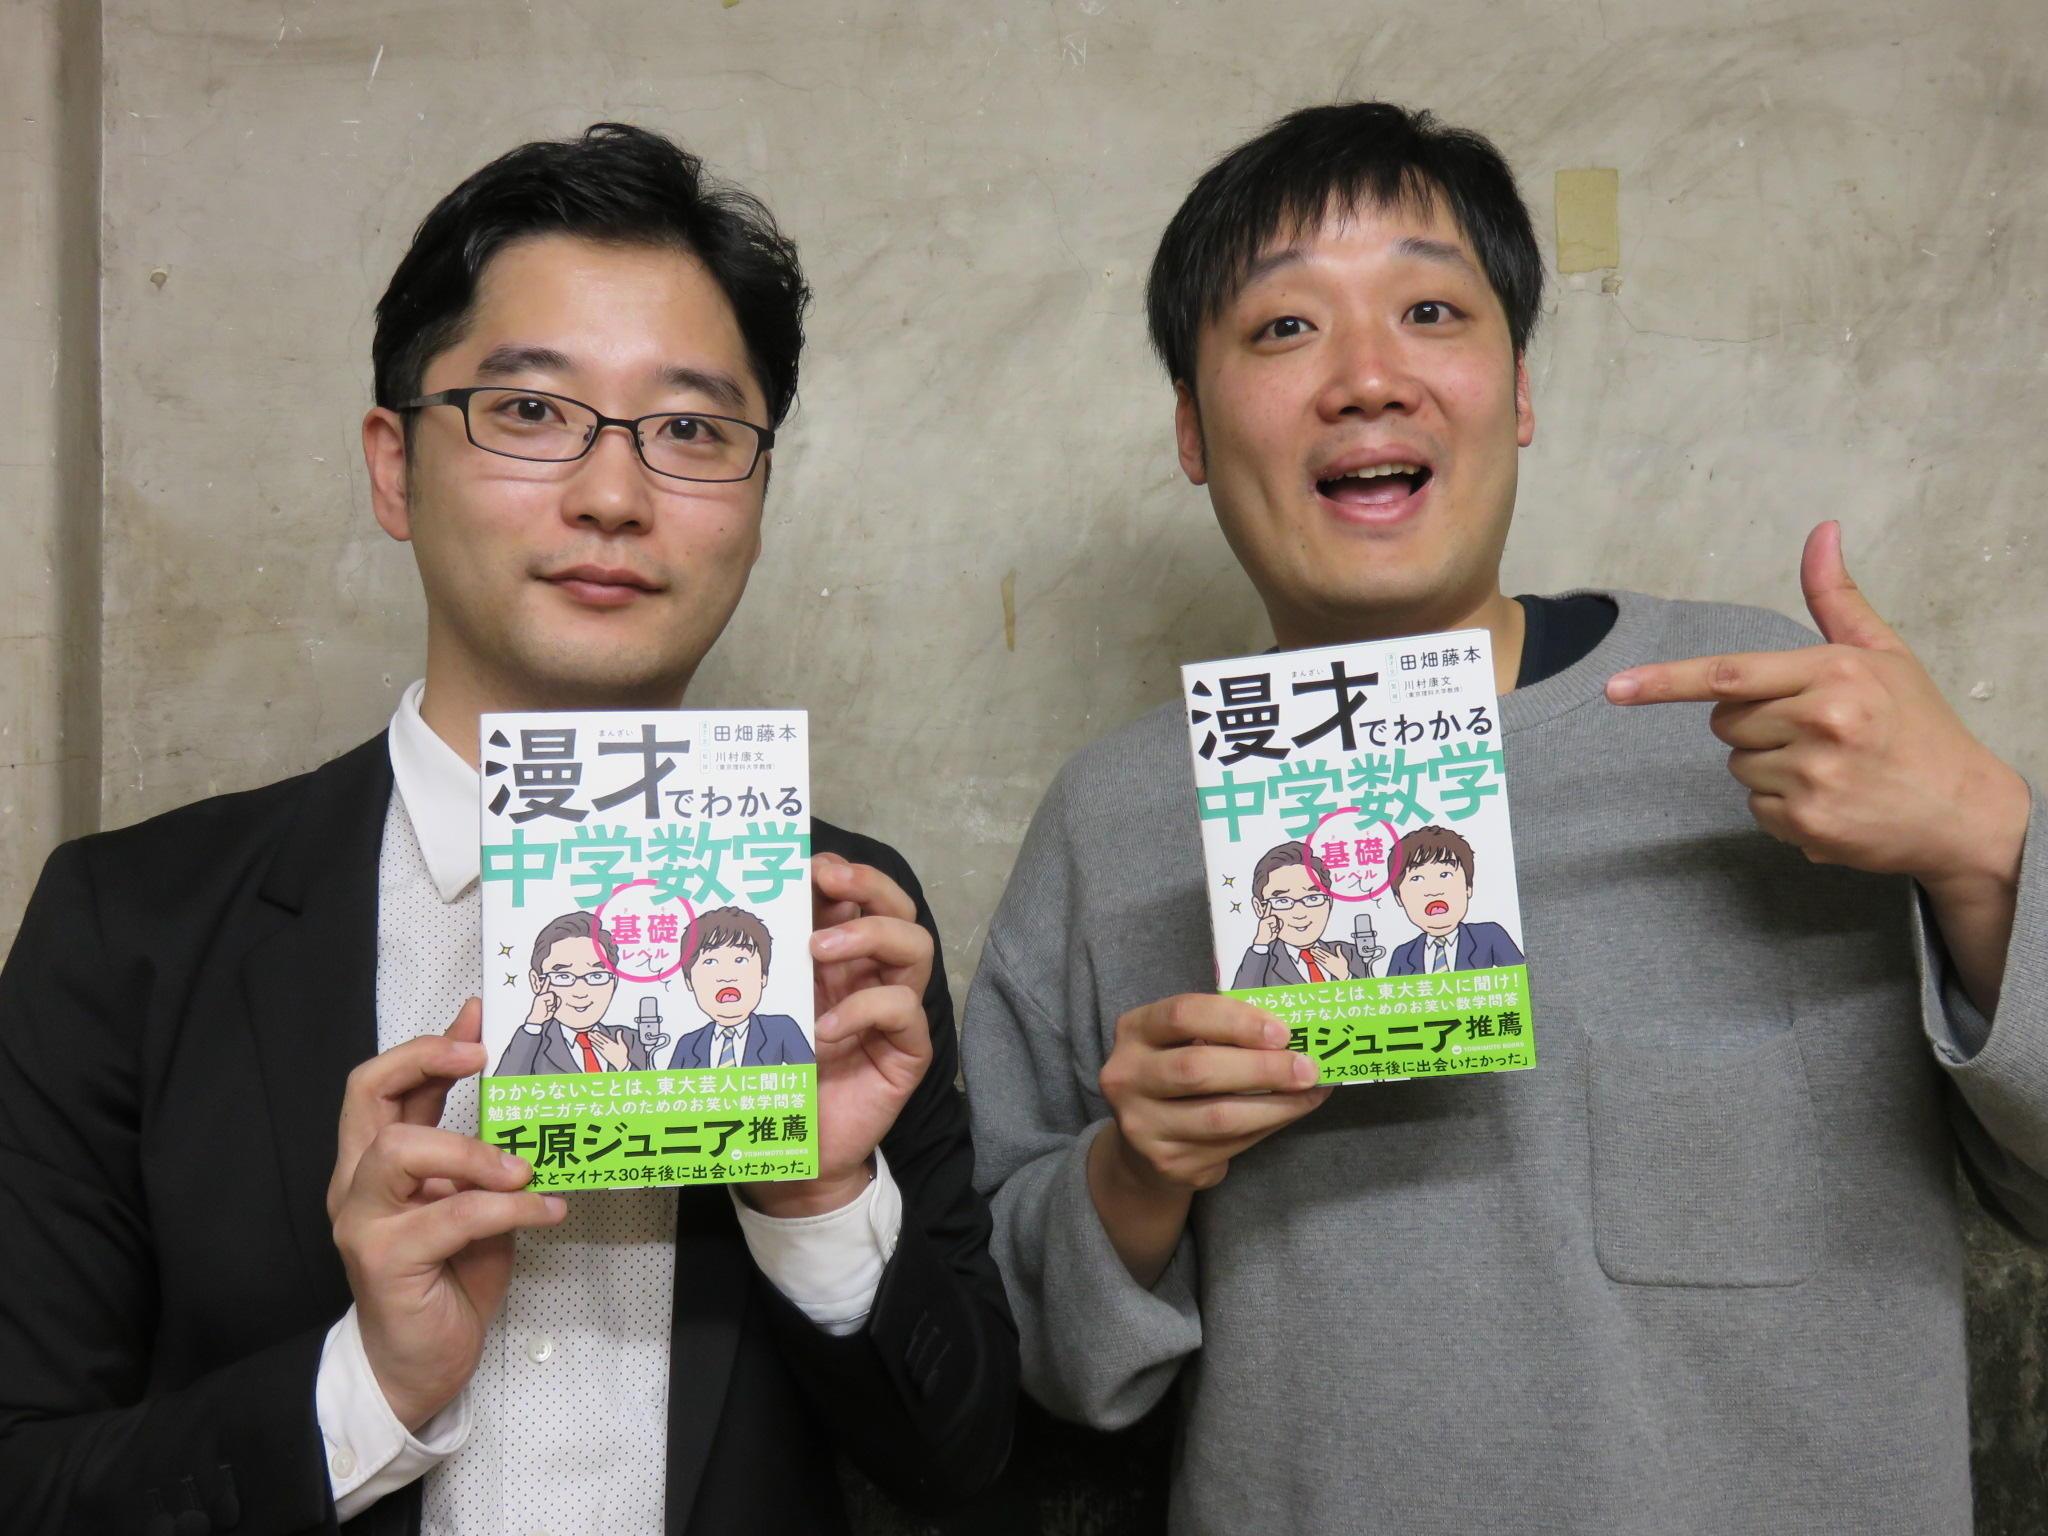 http://news.yoshimoto.co.jp/20170314212910-8bd207bb87690818db5fb108a81b016c0f704252.jpg